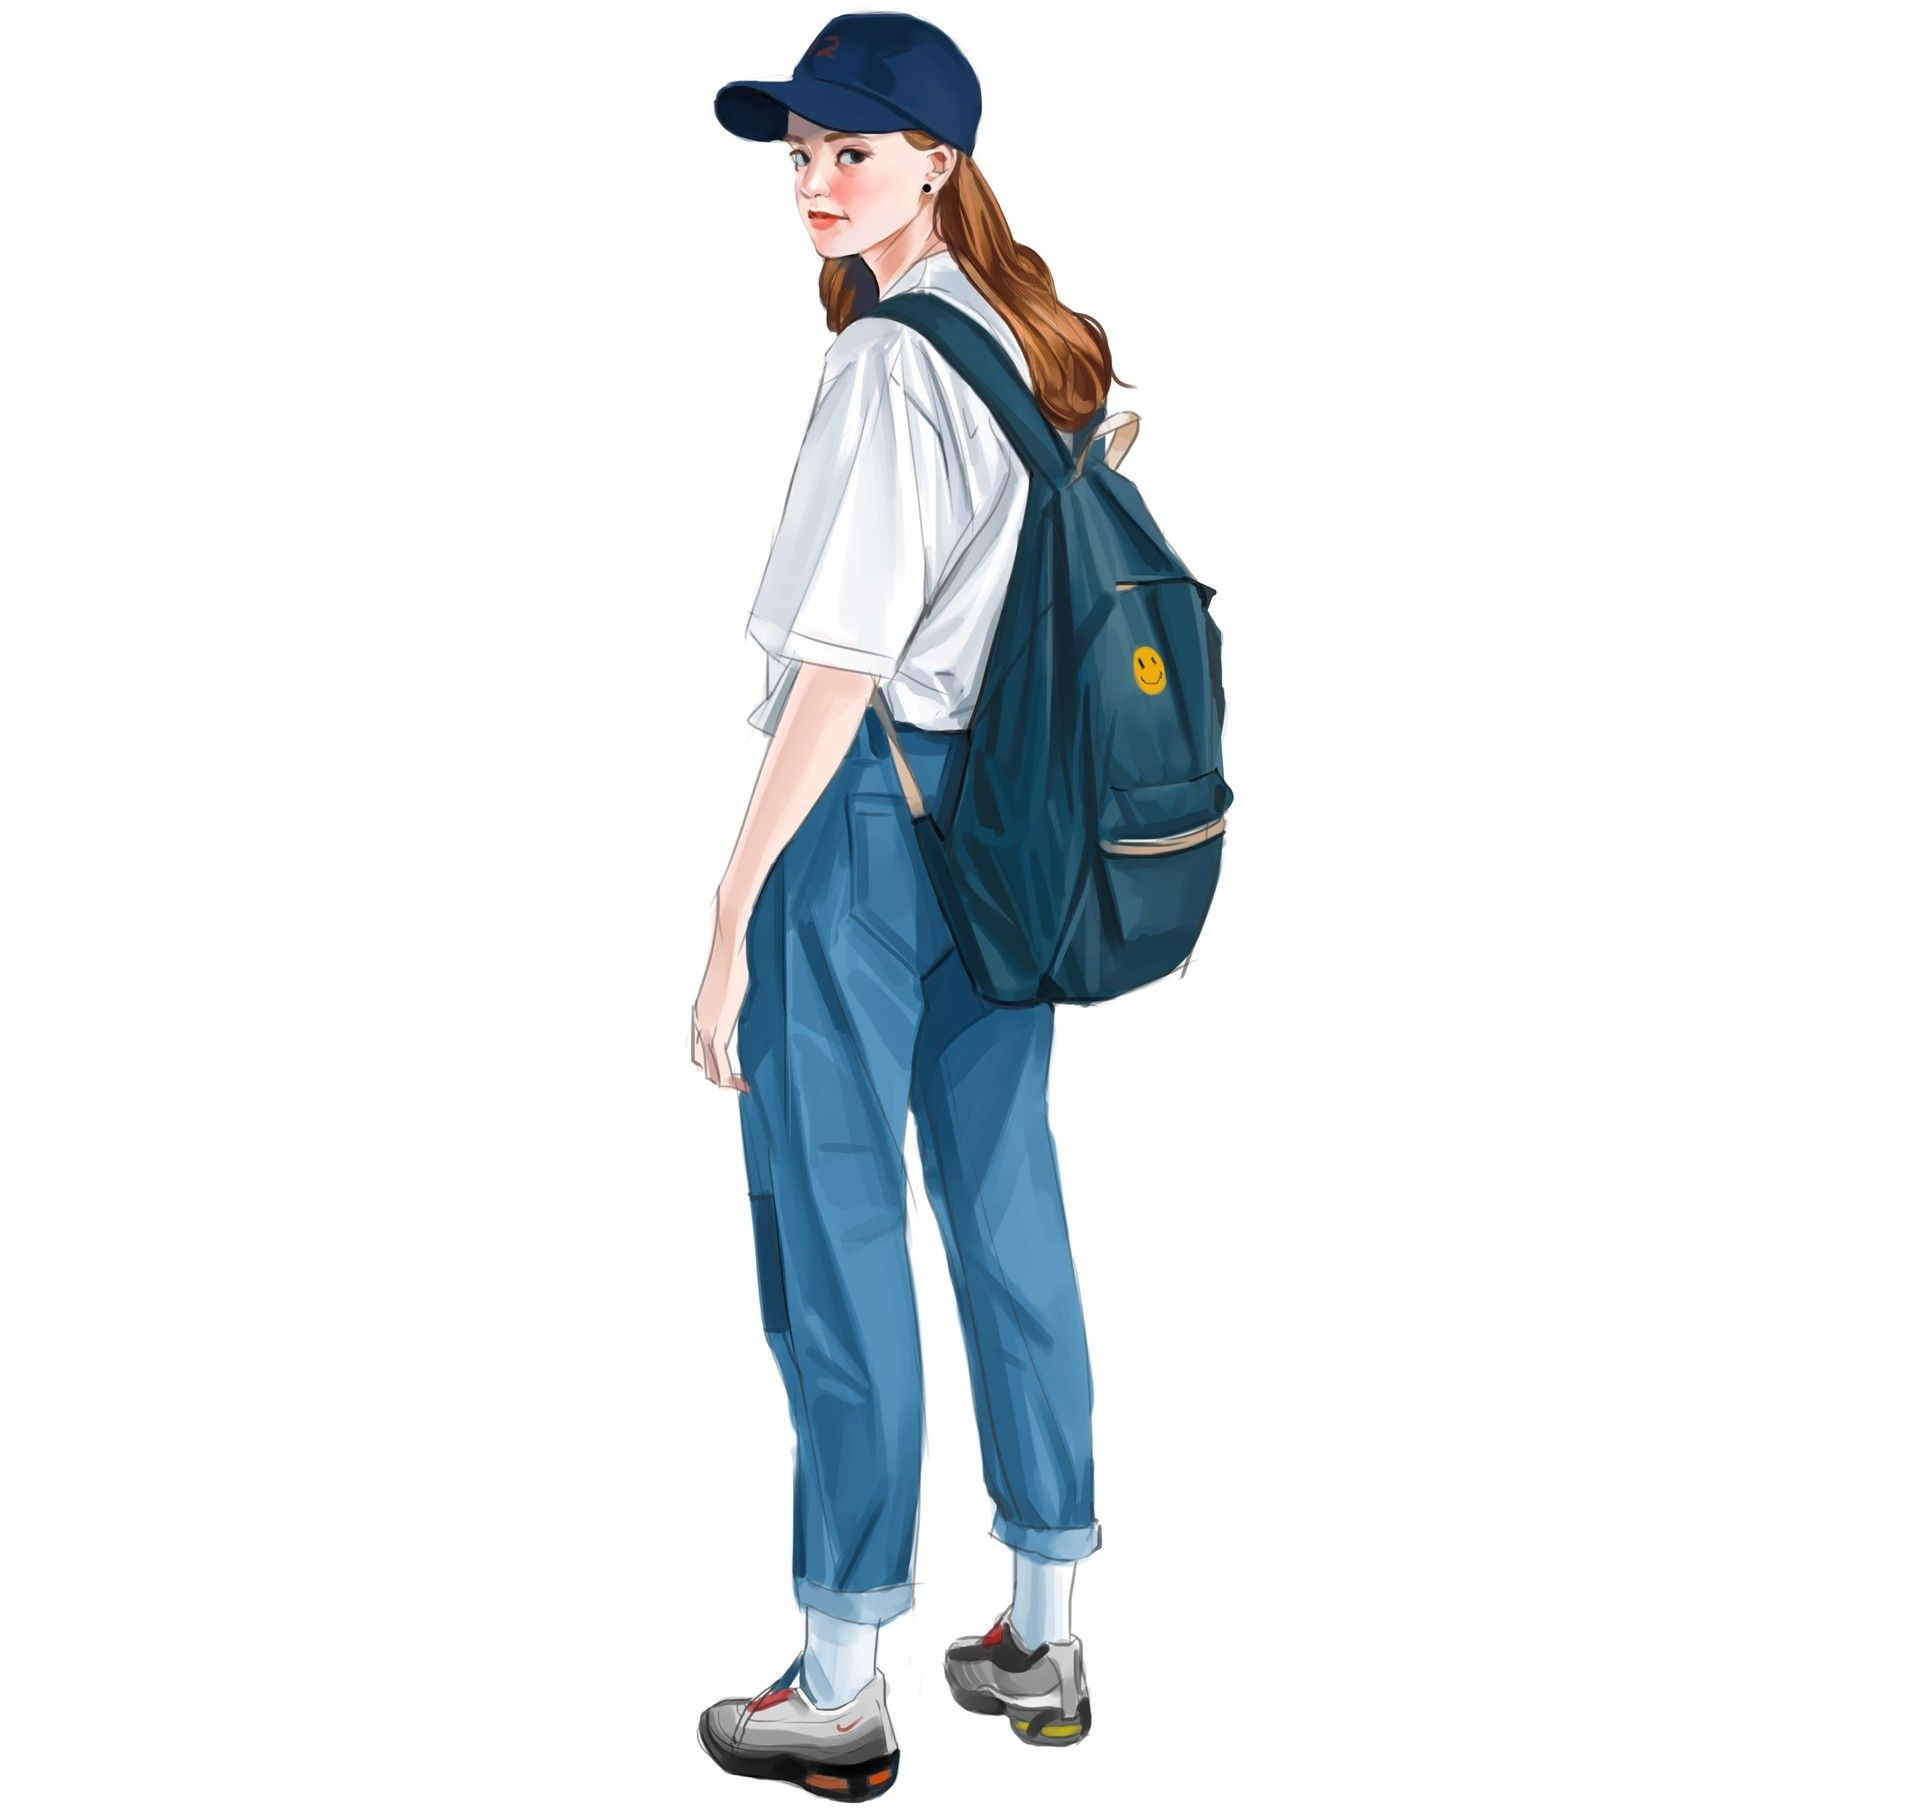 Fashion illust, jong hyun jeon